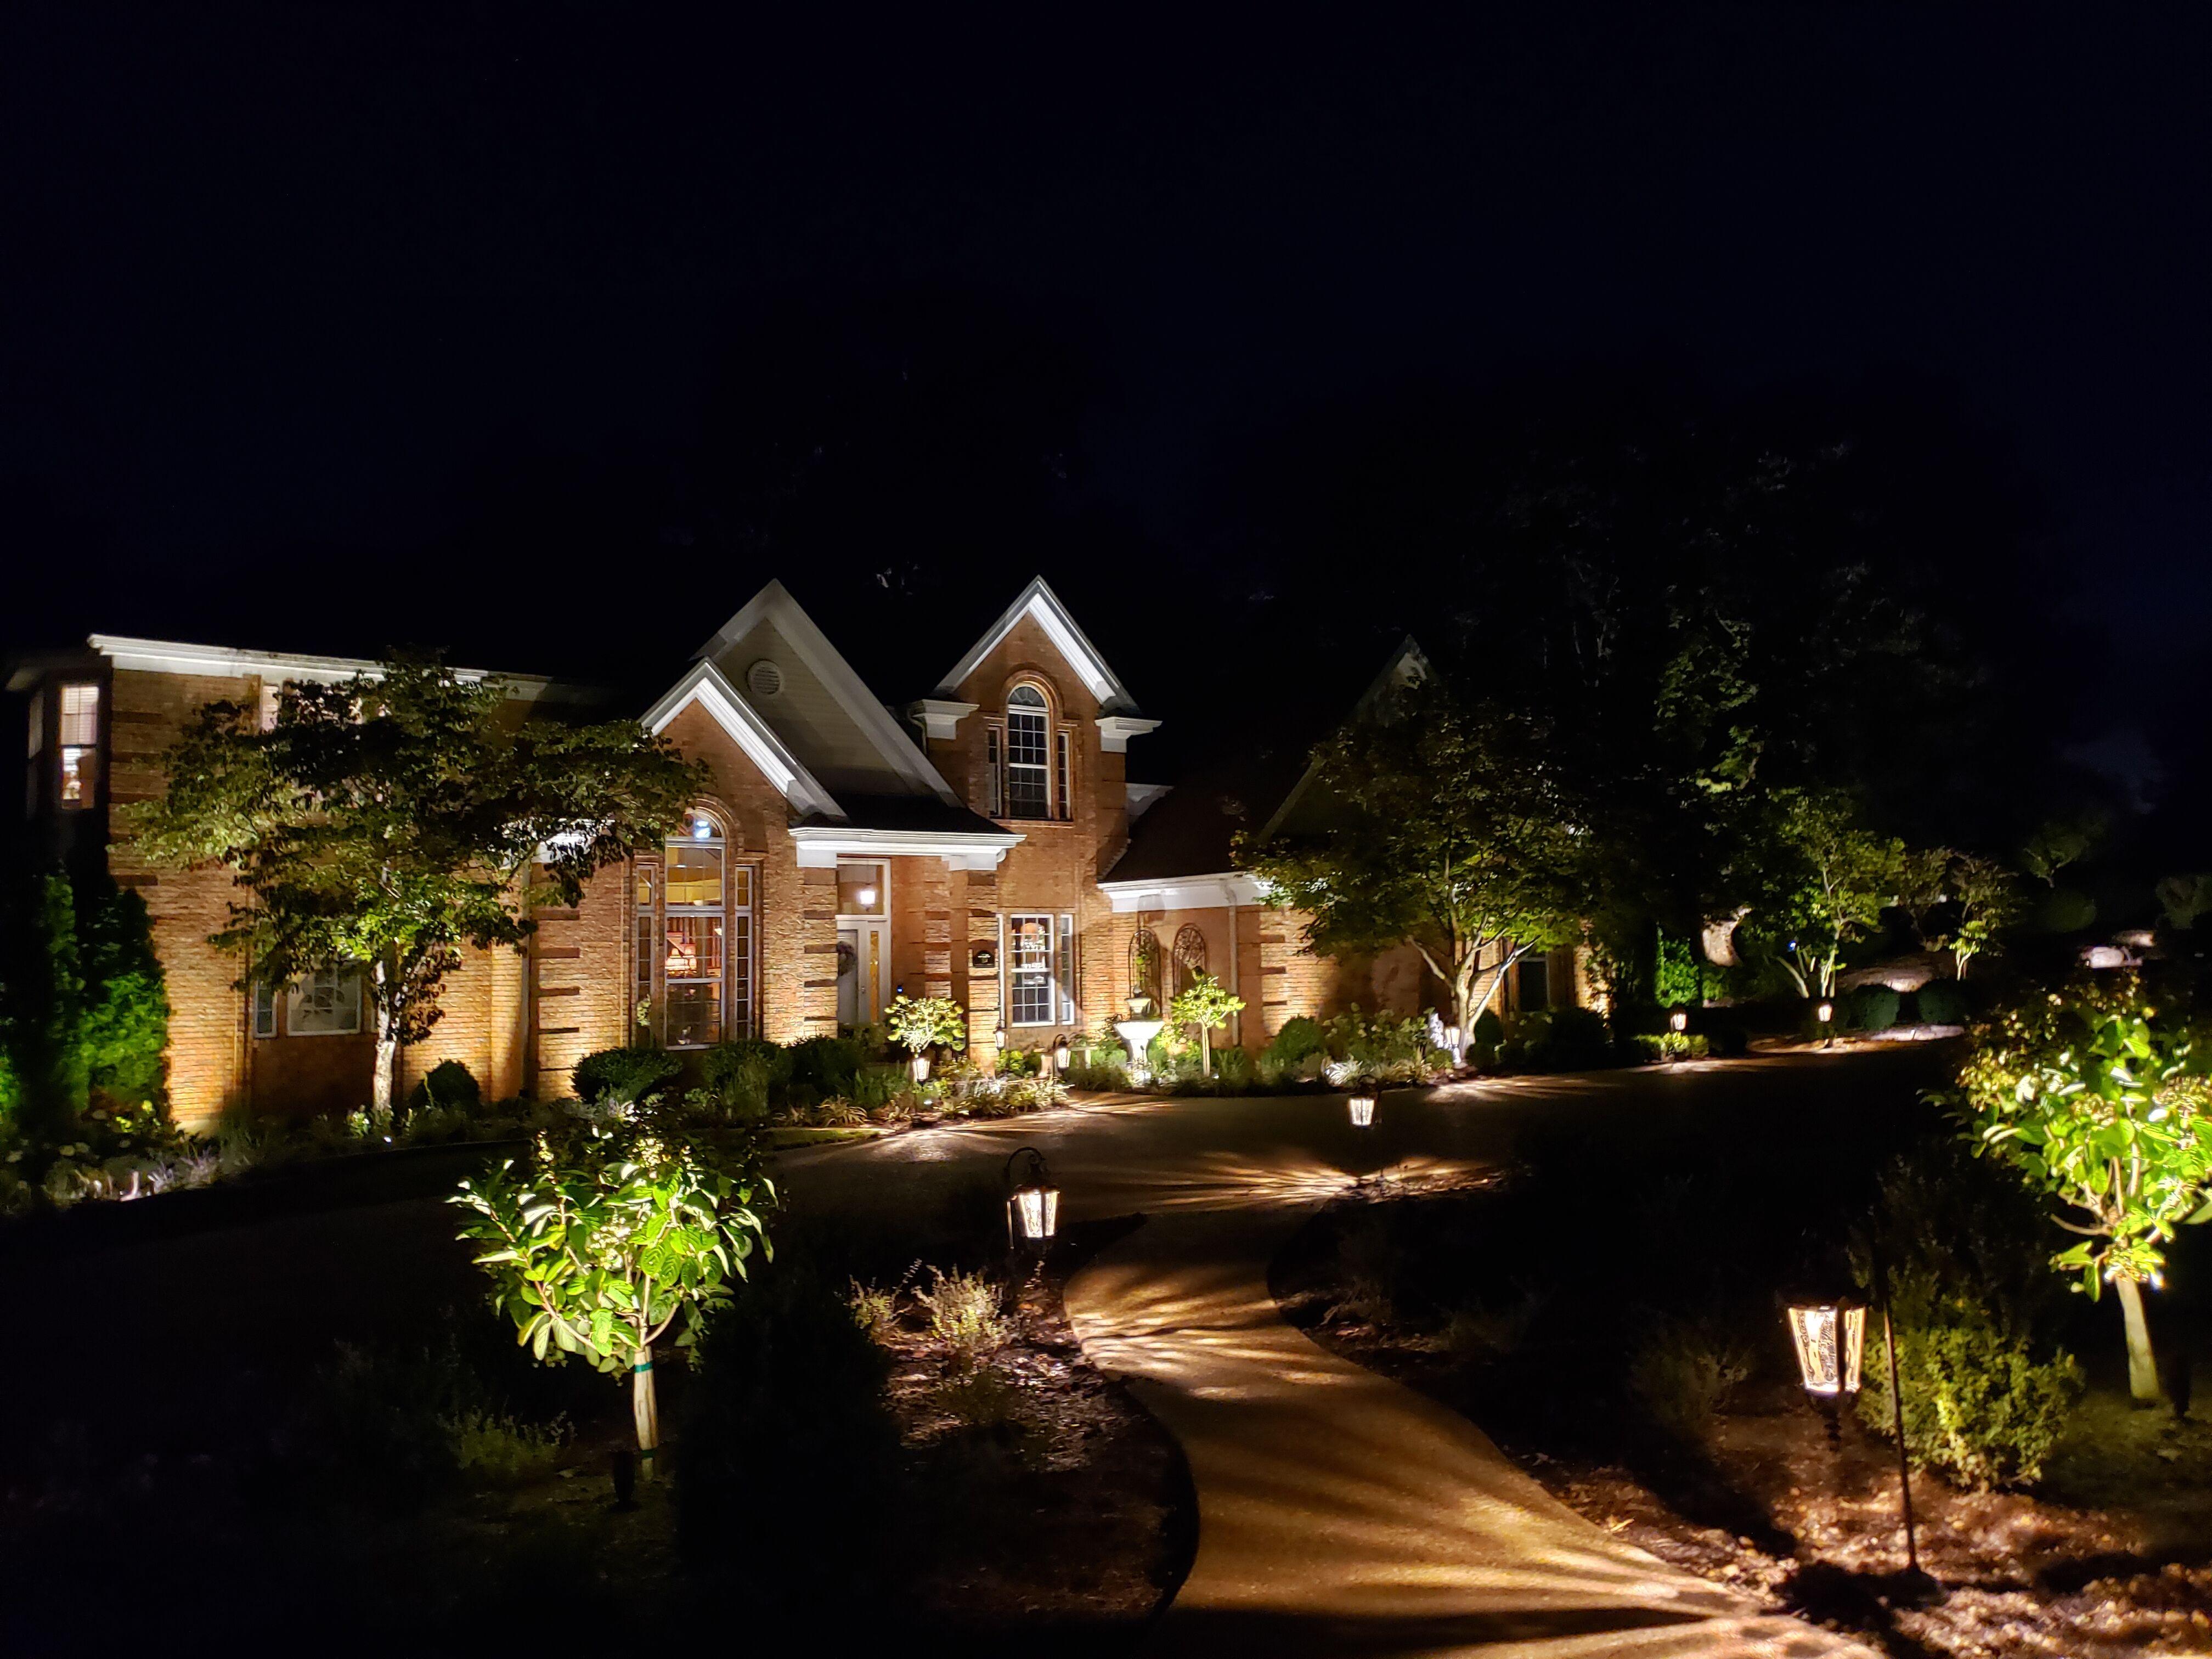 Chesterfield Landscape Lighting